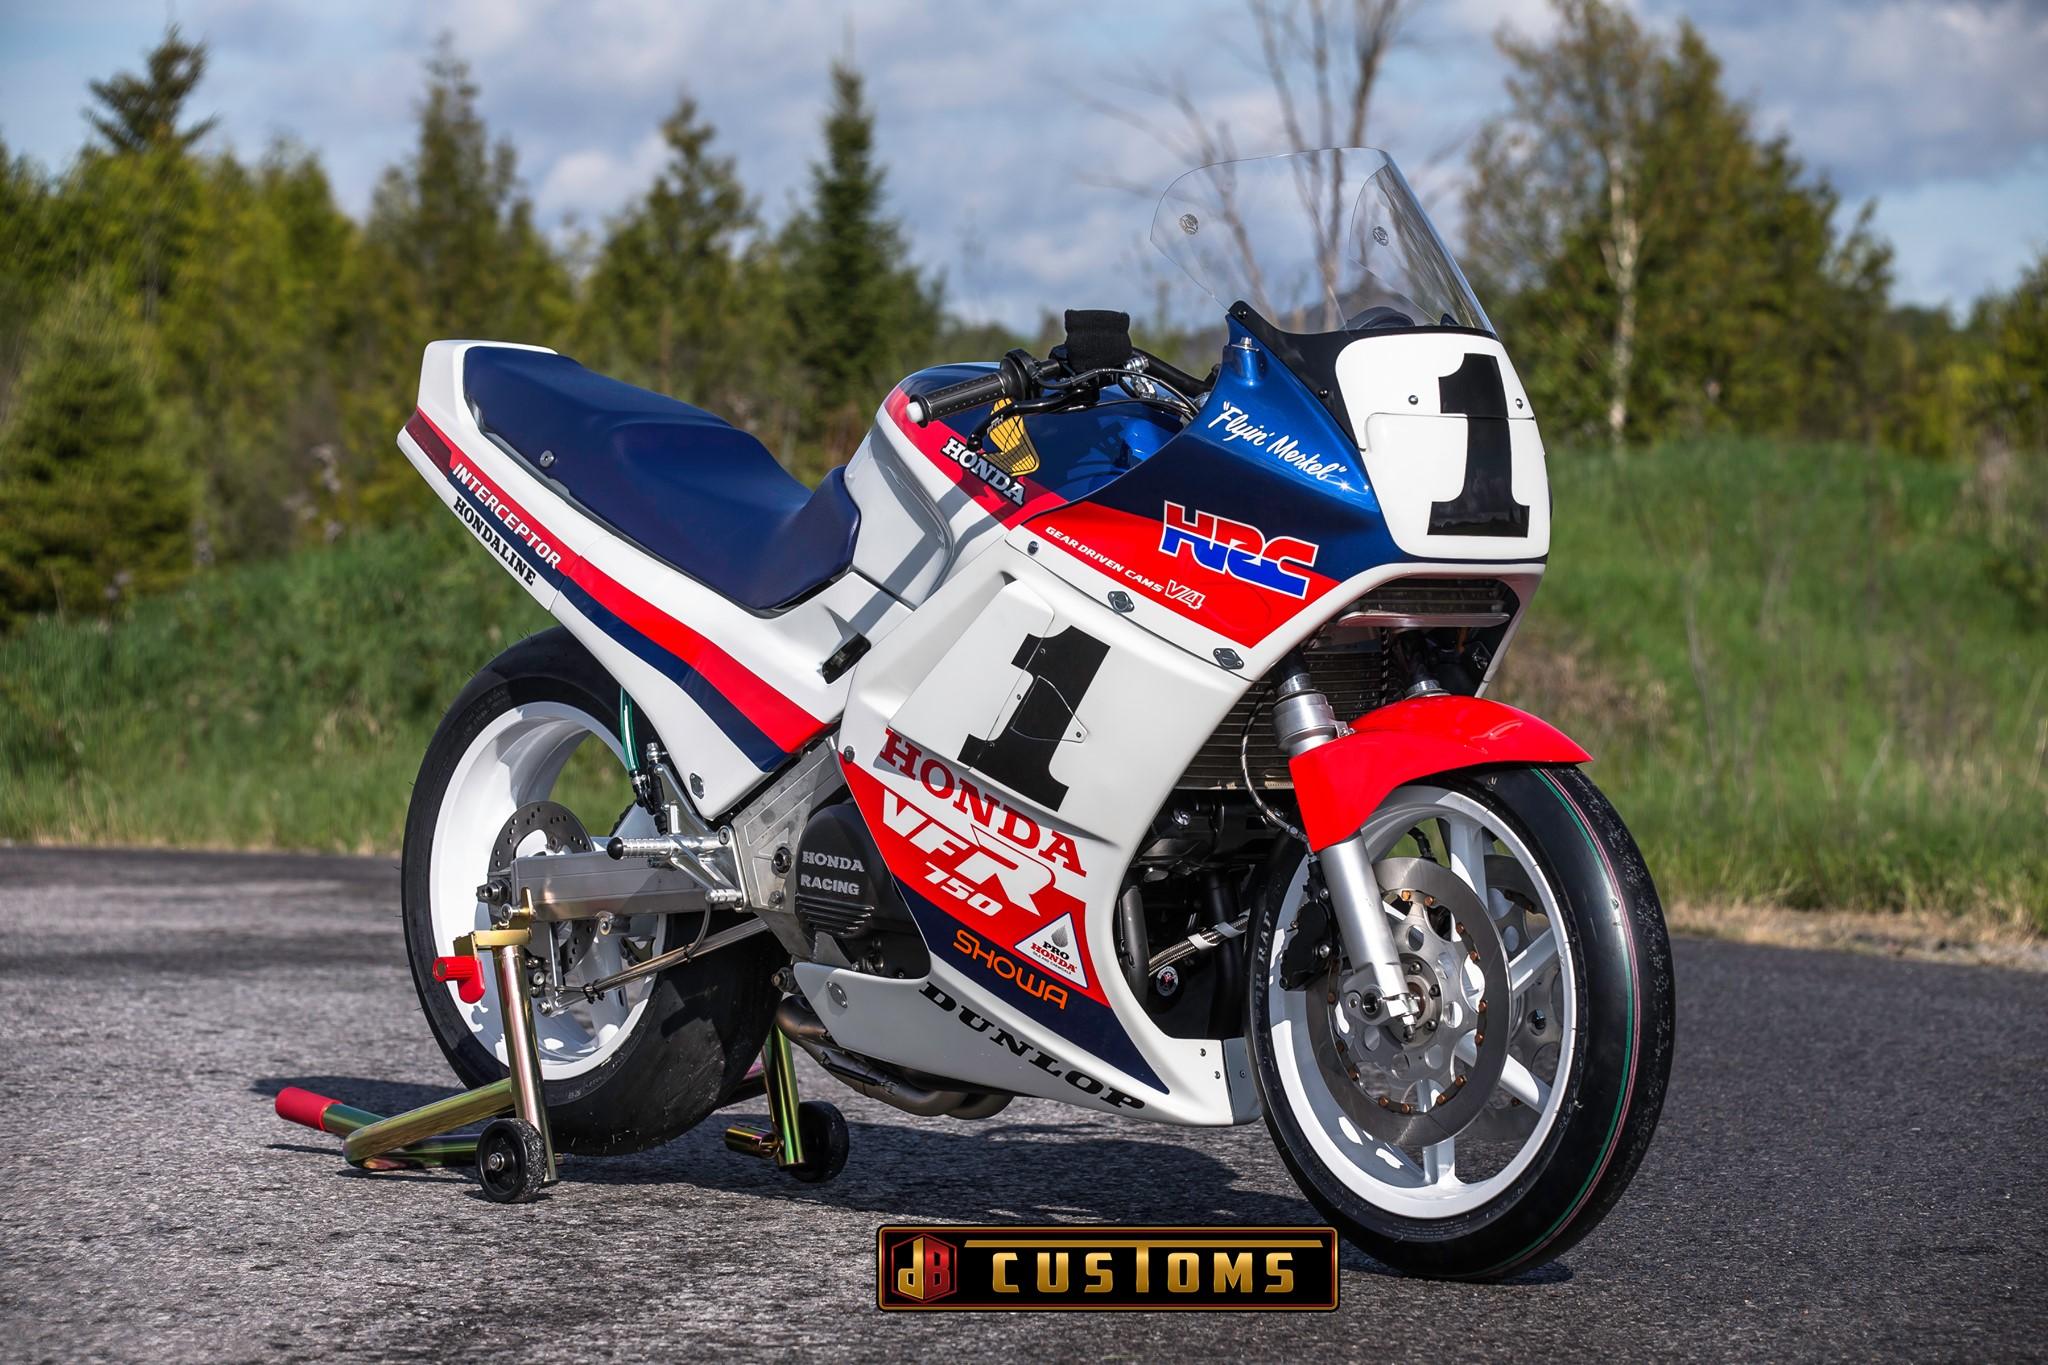 Honda VFR Race Replicas by DBCustom Restomods and Sketchs Ink